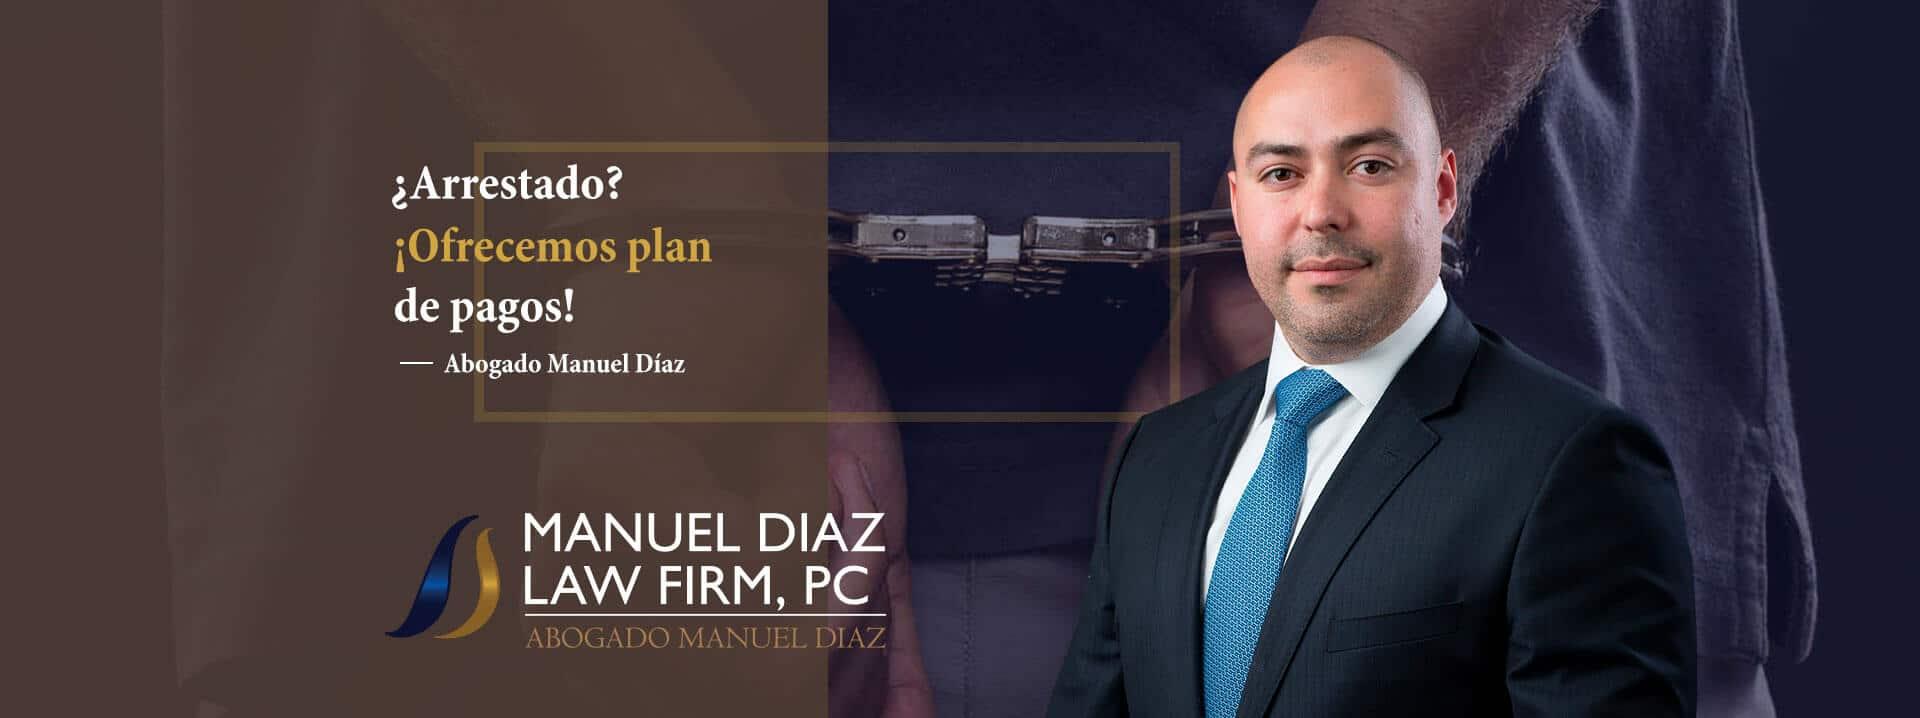 Manuel Diaz - Criminal Defense Lawyer - 1